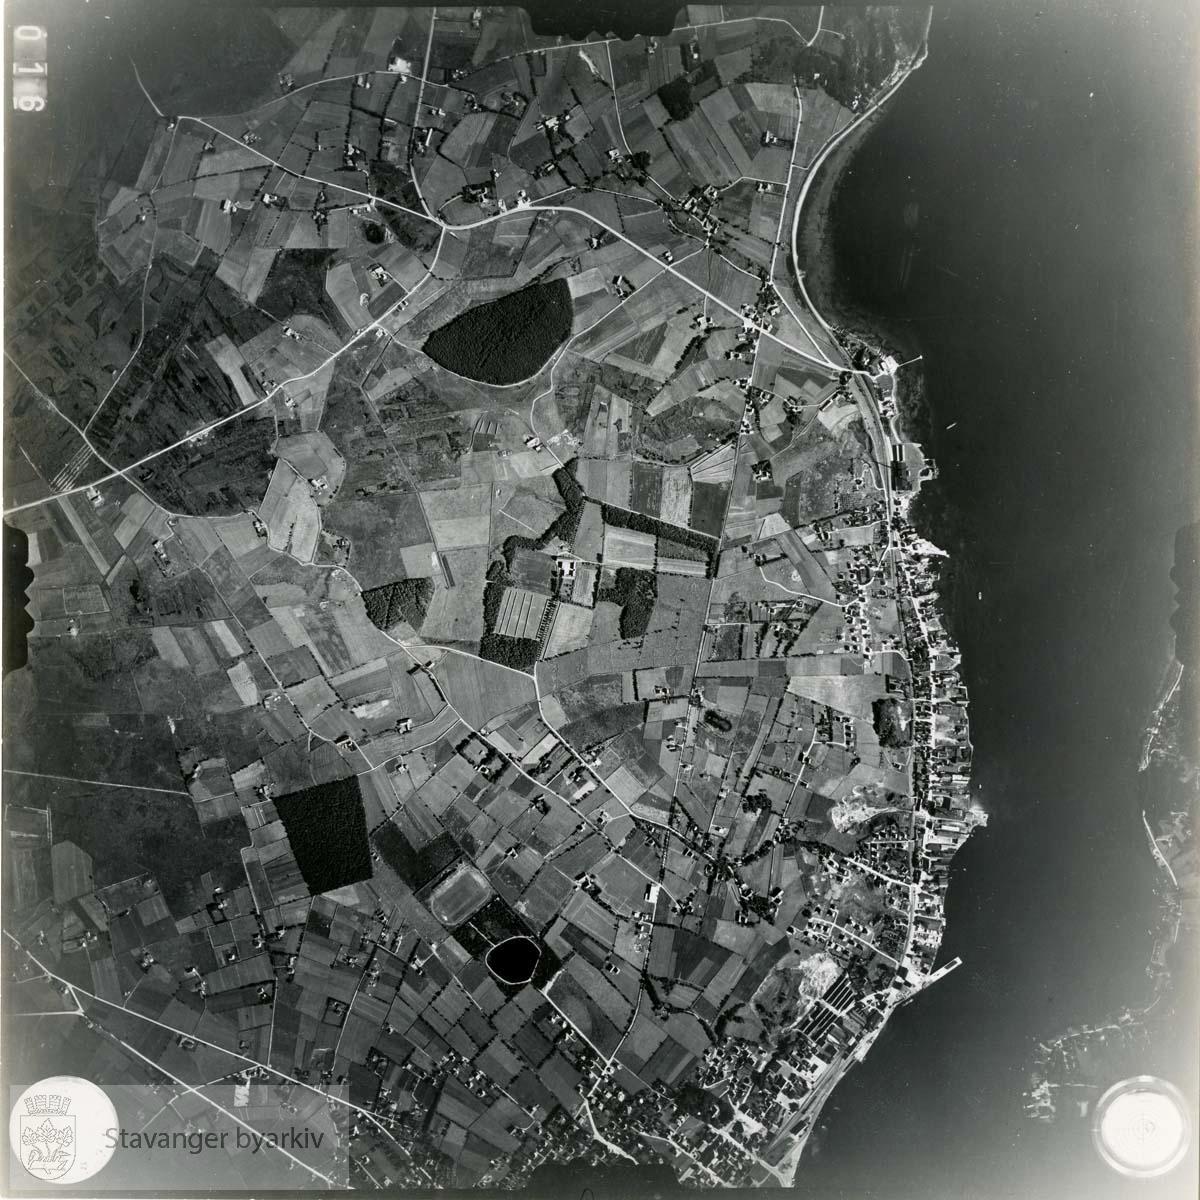 Jfr. kart/fotoplan F16/72..Trones med Gisketjernet og Sandnes stadion, Varatun, Lura...Se ByStW_Uca_002 (kan lastes ned under fanen for kart på Stavangerbilder)